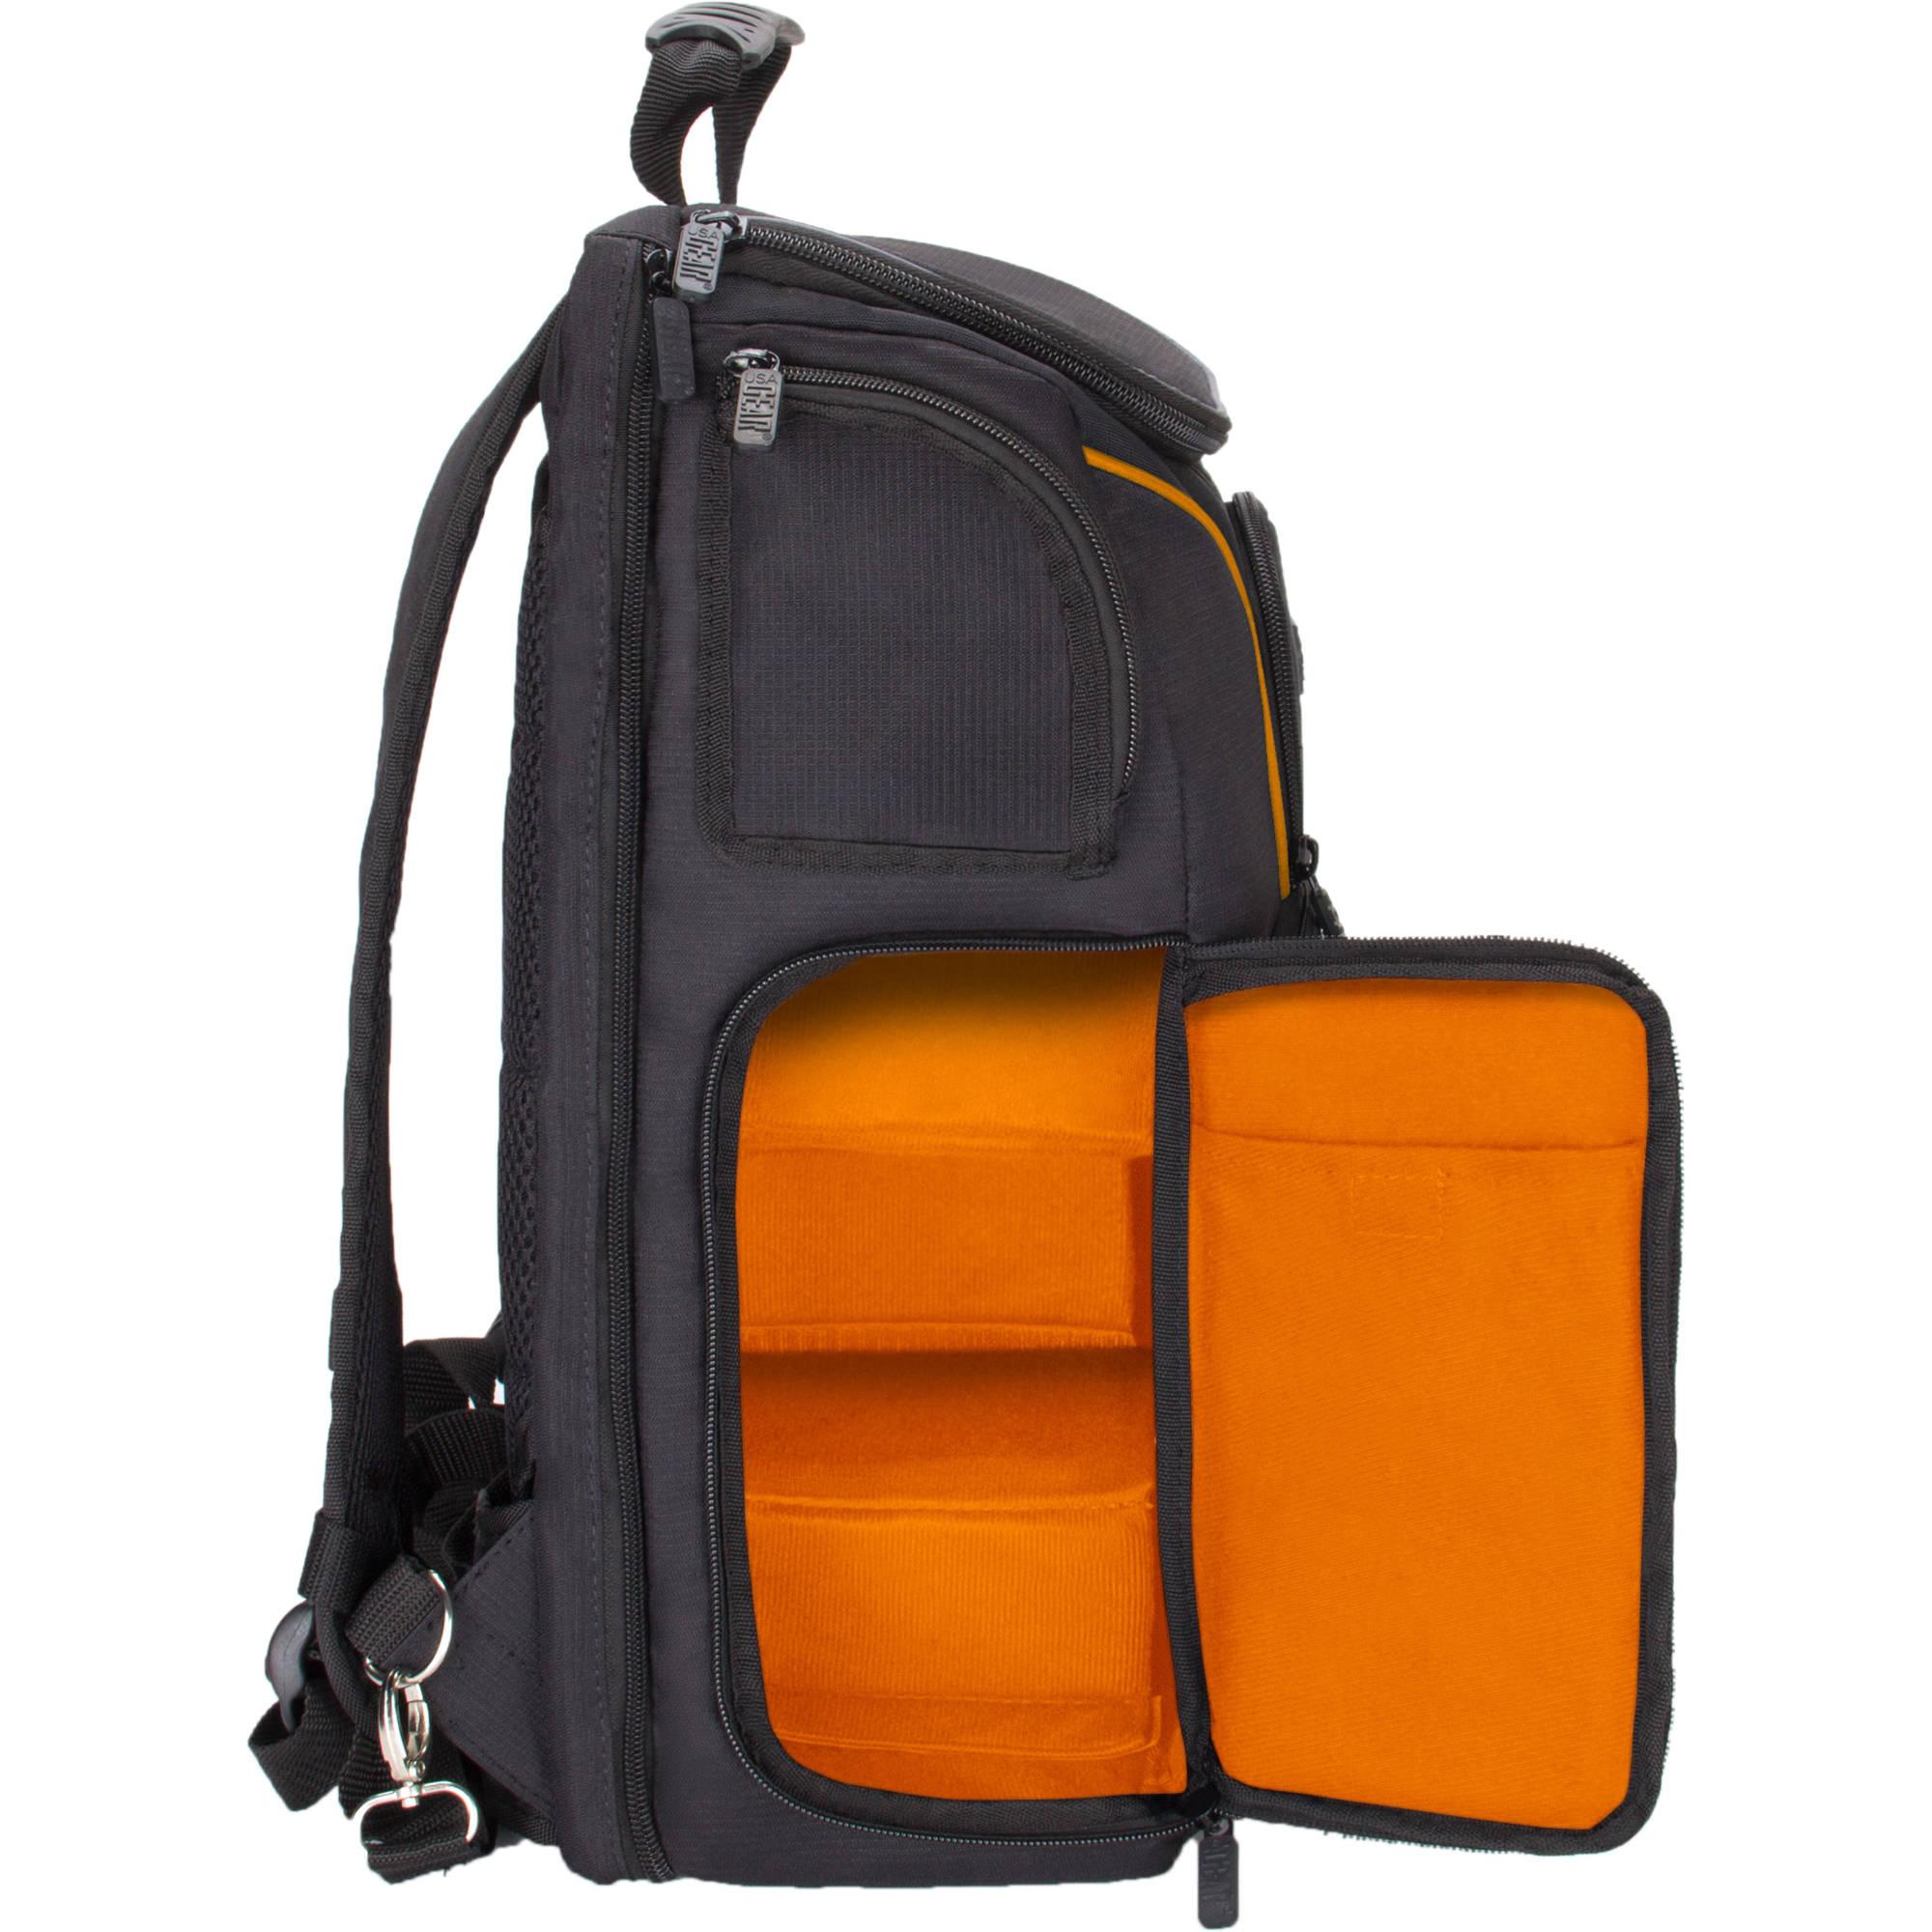 S-ZONE Waterproof Anti-Shock Waxed Canvas SLR DSLR Camera Backpack Large Capacity Camera Case Bag 14 inch Laptop and Tripod Travel Bag Professional Camera Lens